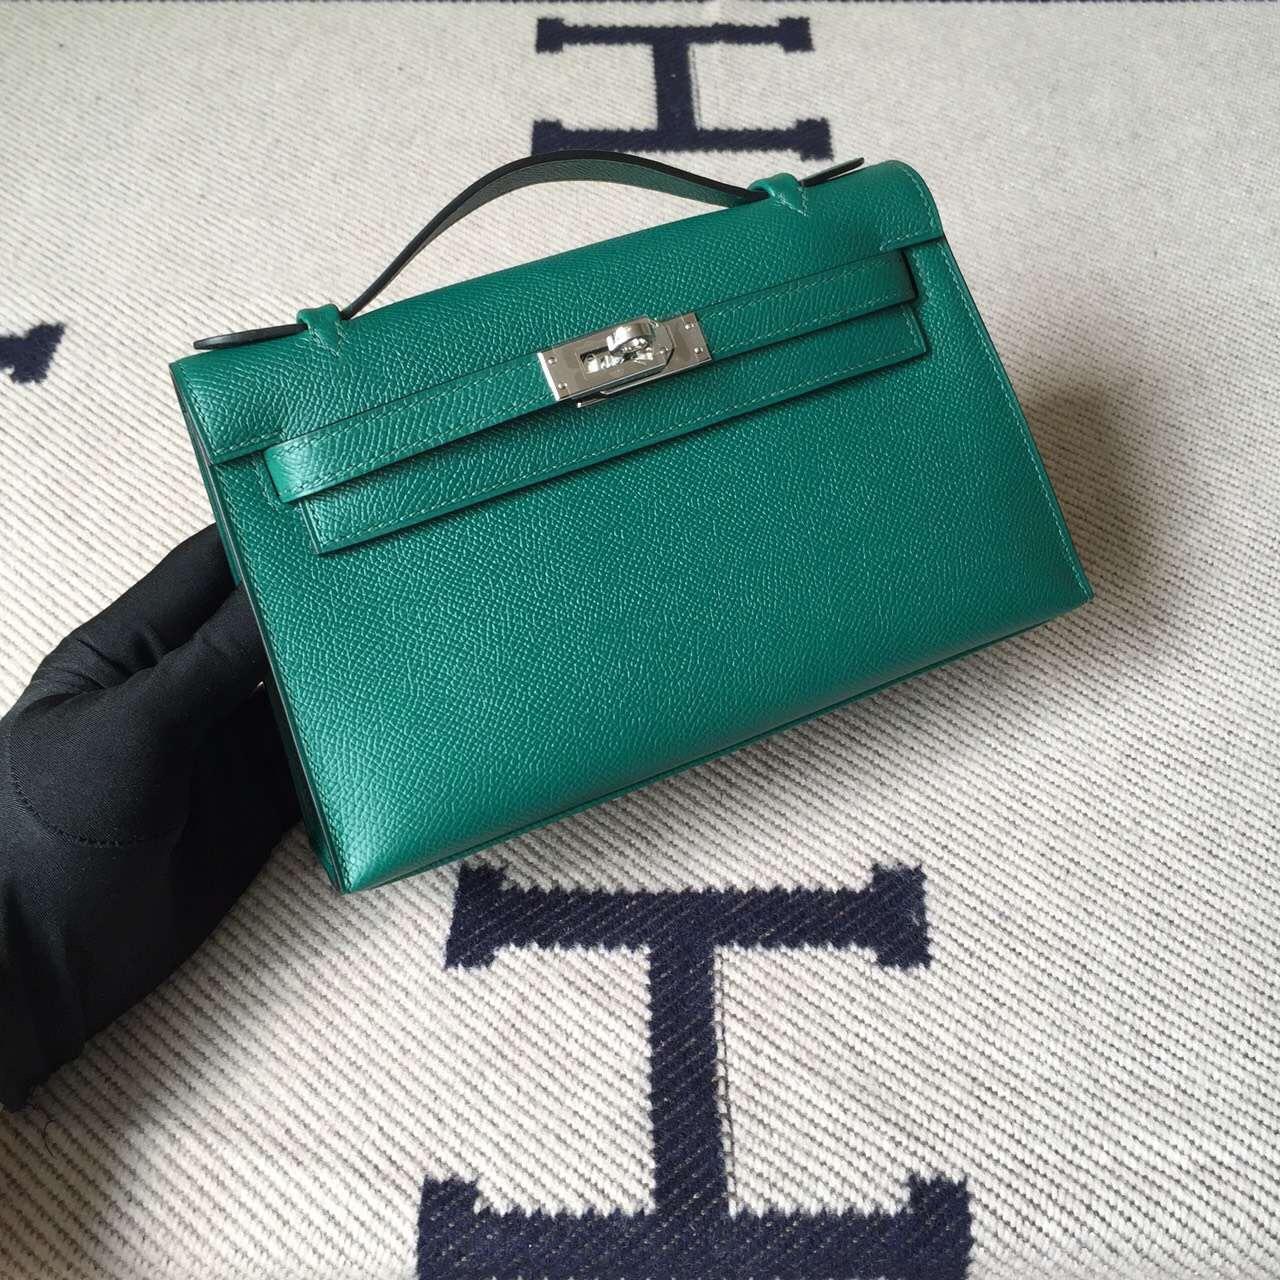 Discount Hermes Minikelly Pochette22CM Bag Z6 Malachite Green Epsom Leather